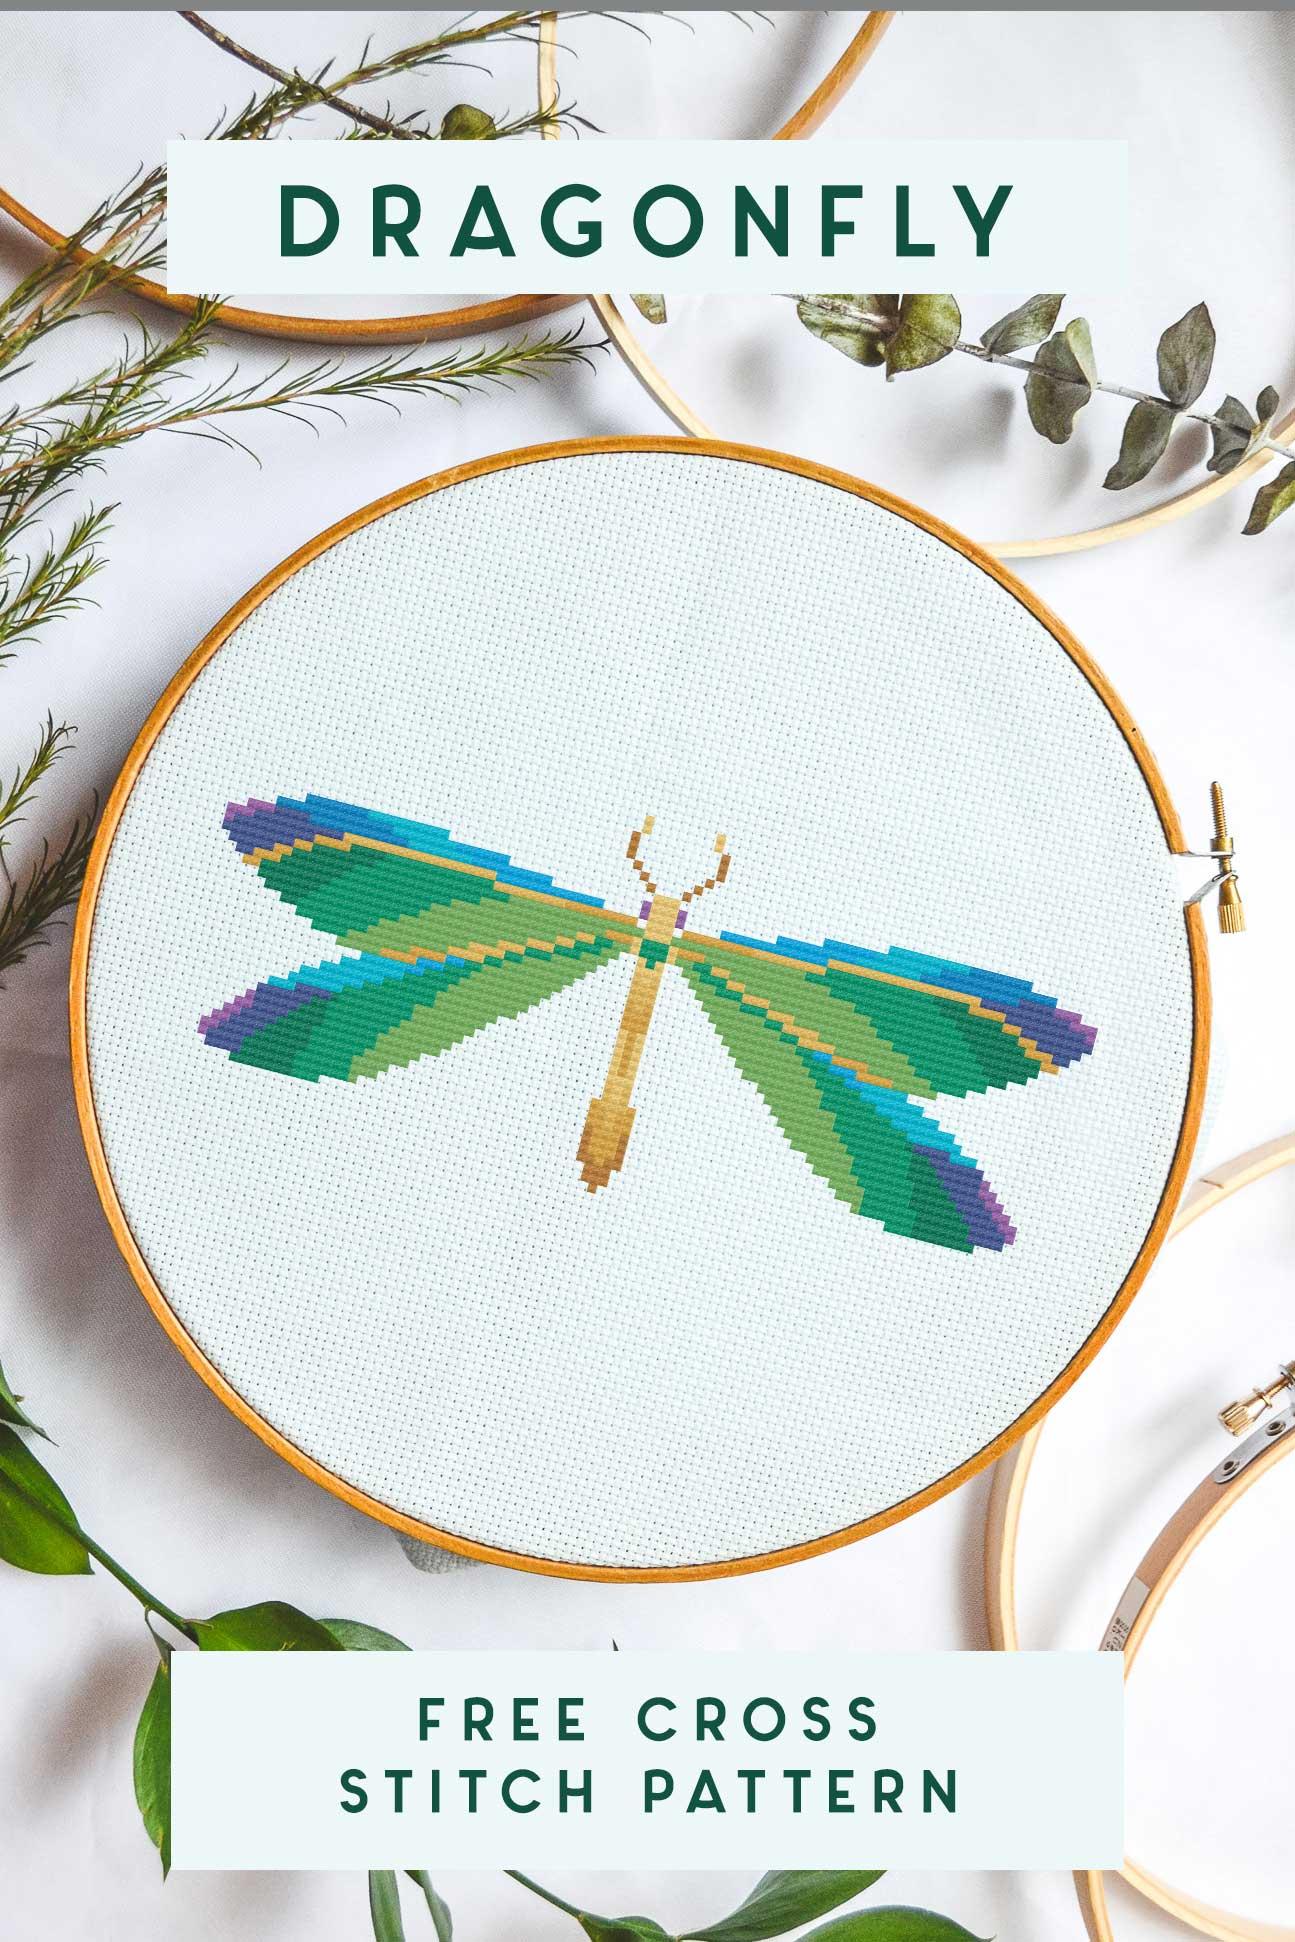 dragonfly-cross-stitch-free-pattern